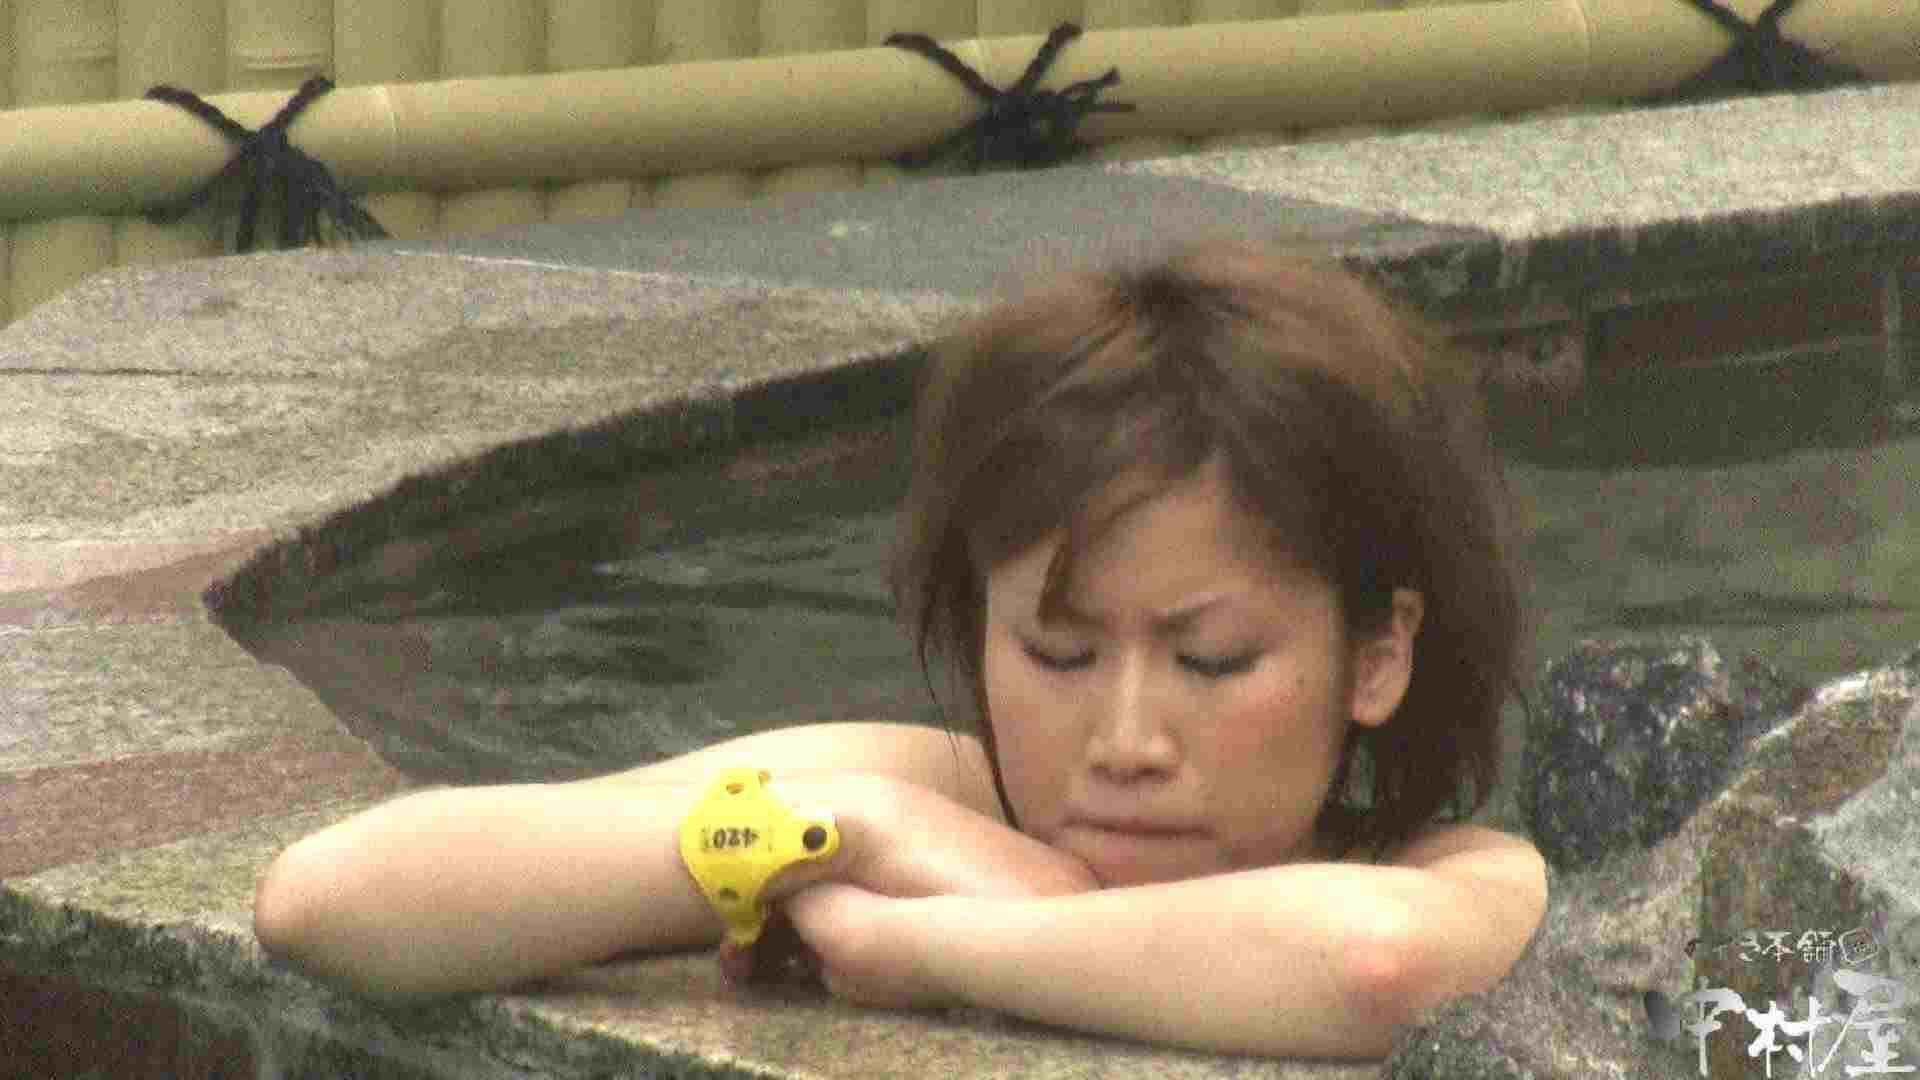 Aquaな露天風呂Vol.918 盗撮師作品  75pic 21